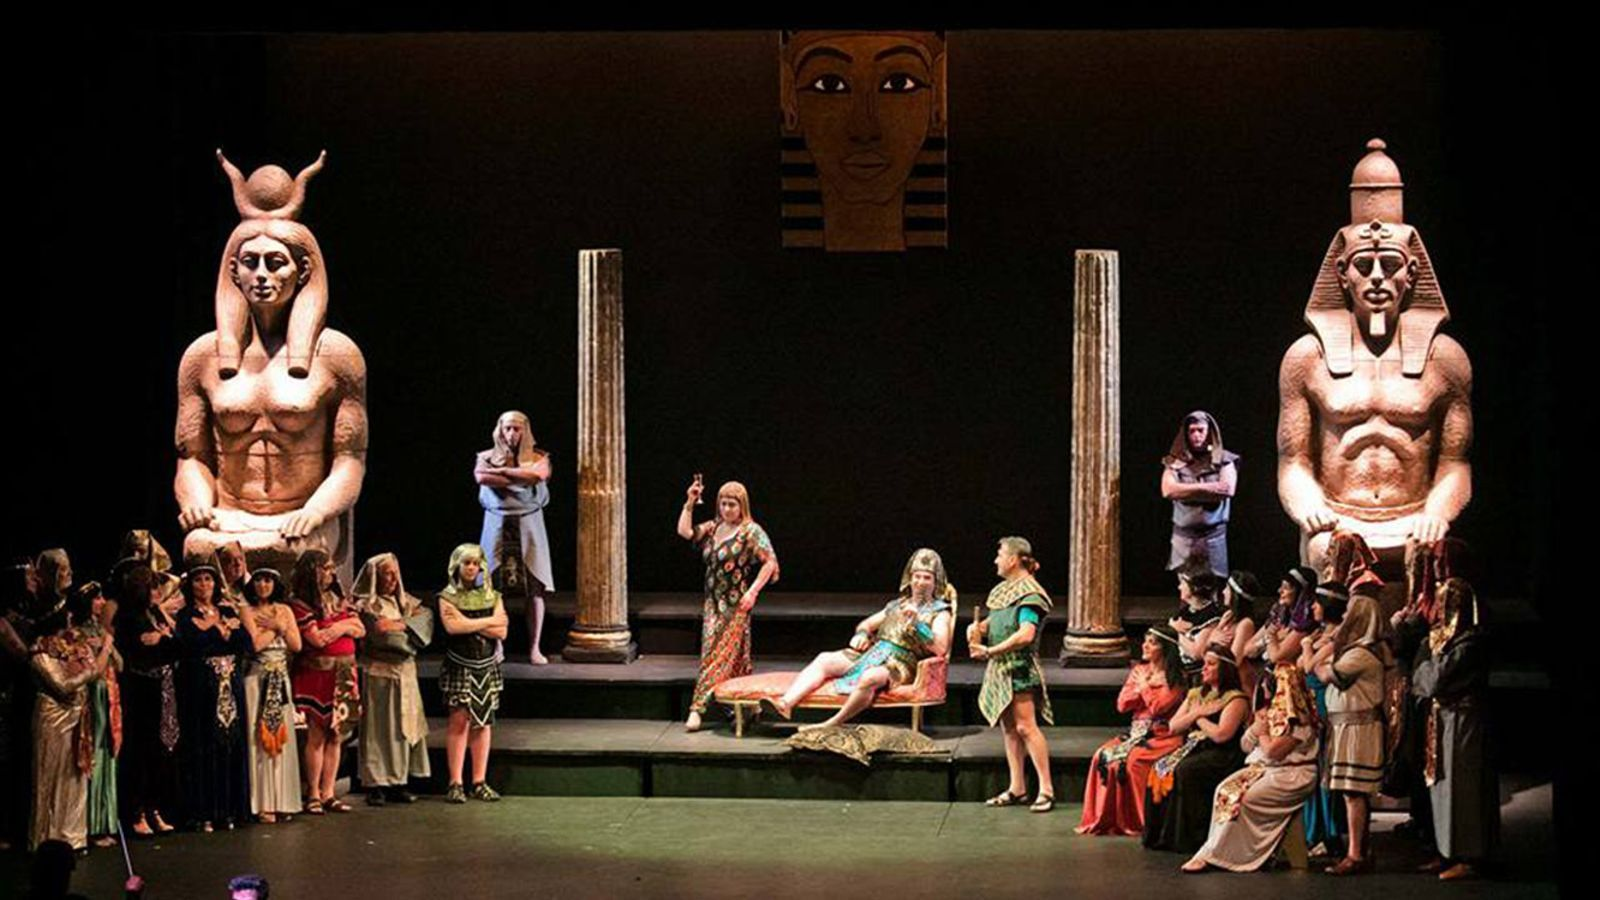 Un moment de l'espectacle 'La Corte del Faraón'. / FACEBOOK ANDORRA LÍRICA